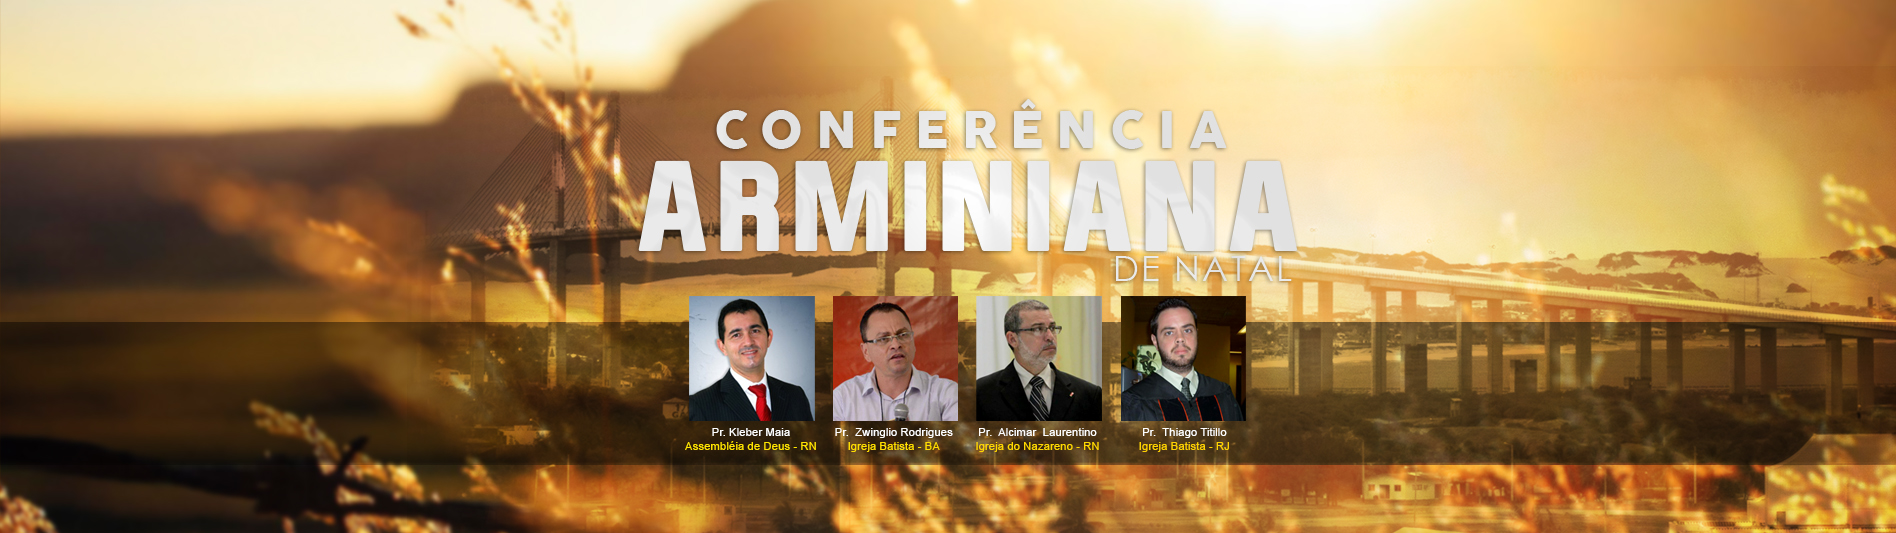 Conferência Arminiana